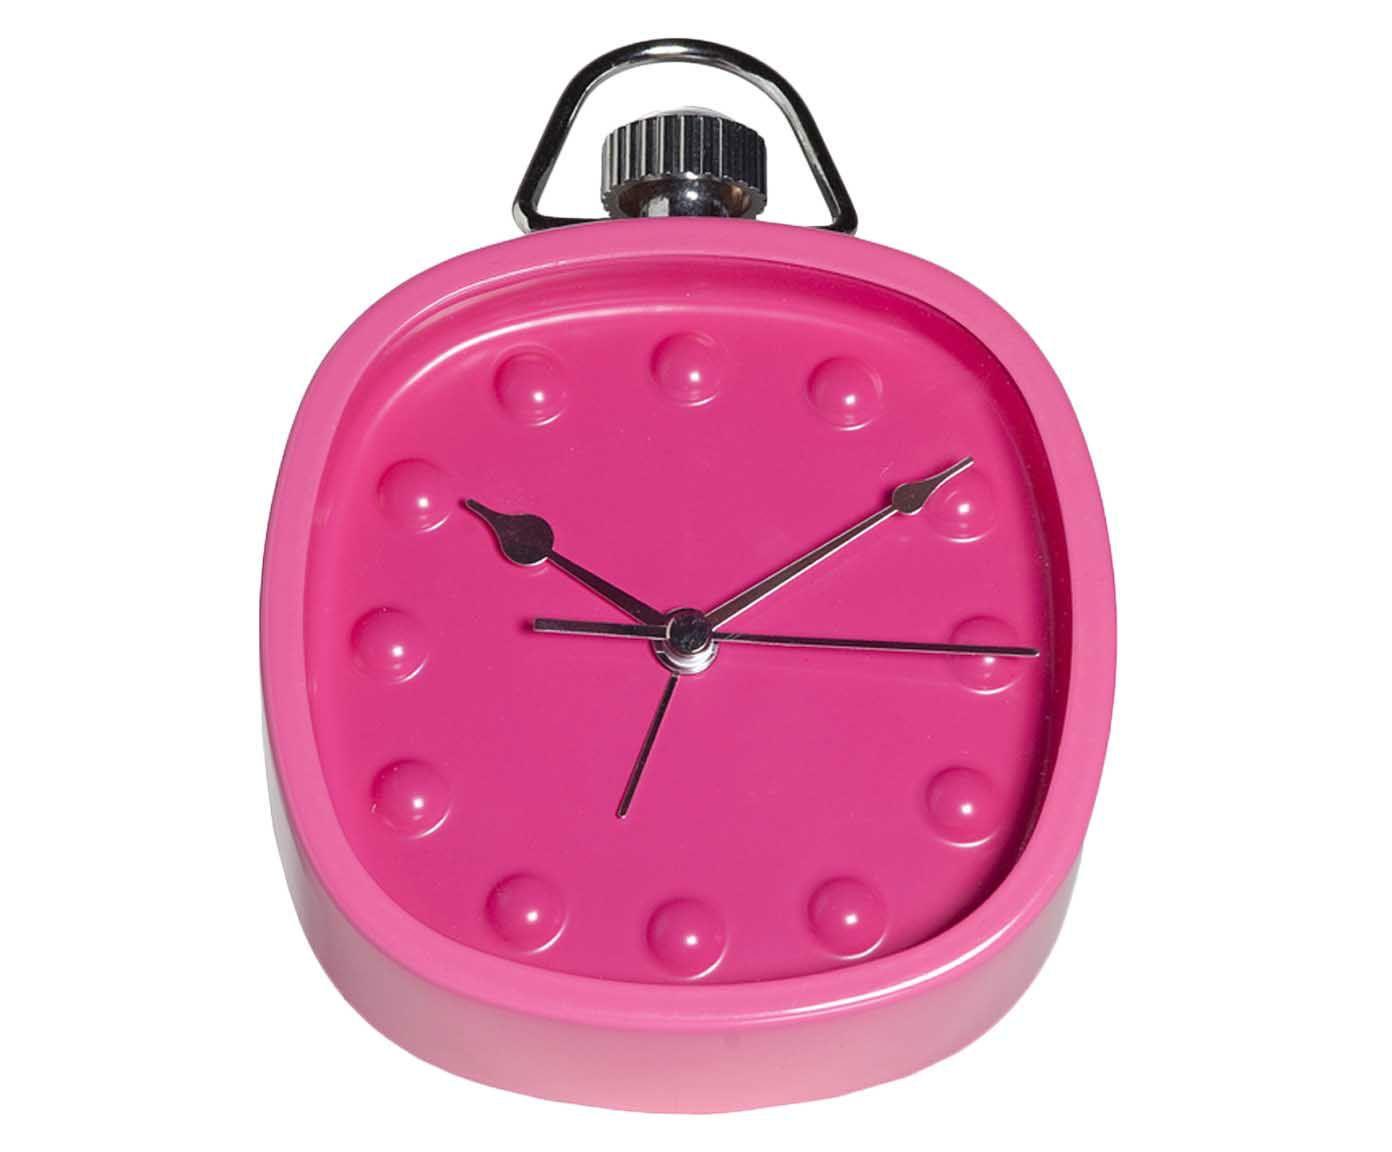 Relógio Despertador Celic - Rosa   Westwing.com.br